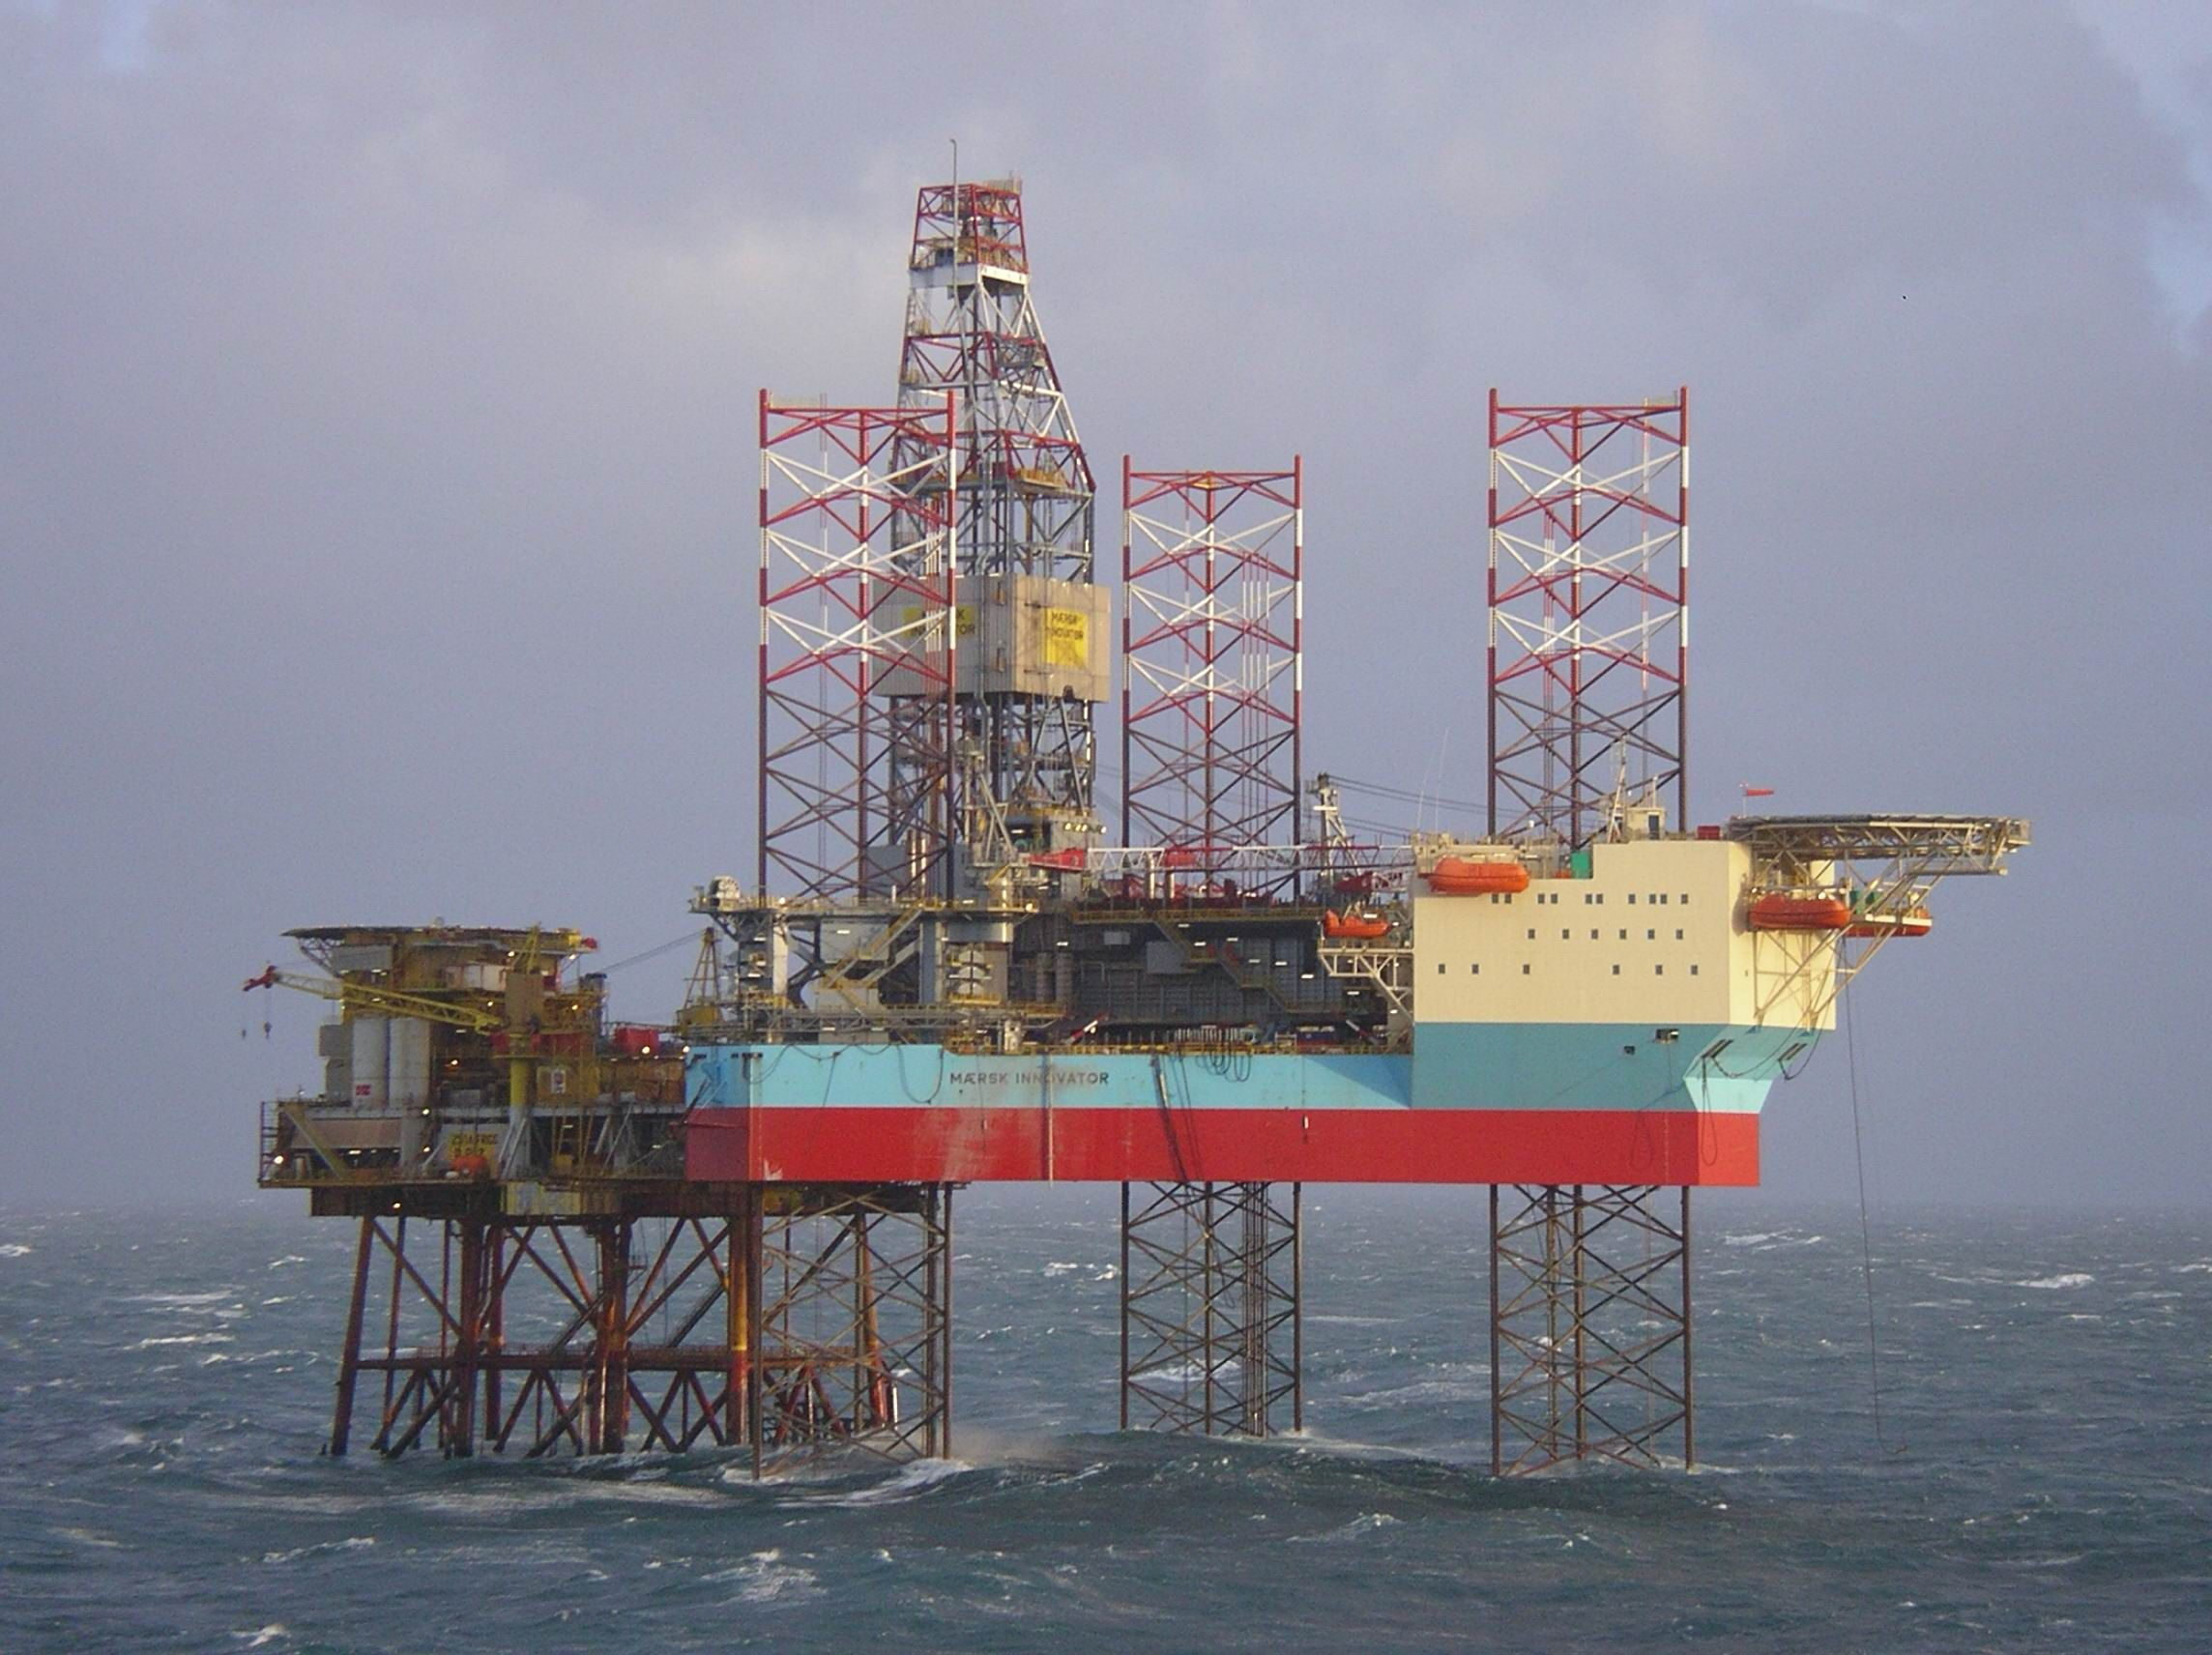 Maersk Innovator.